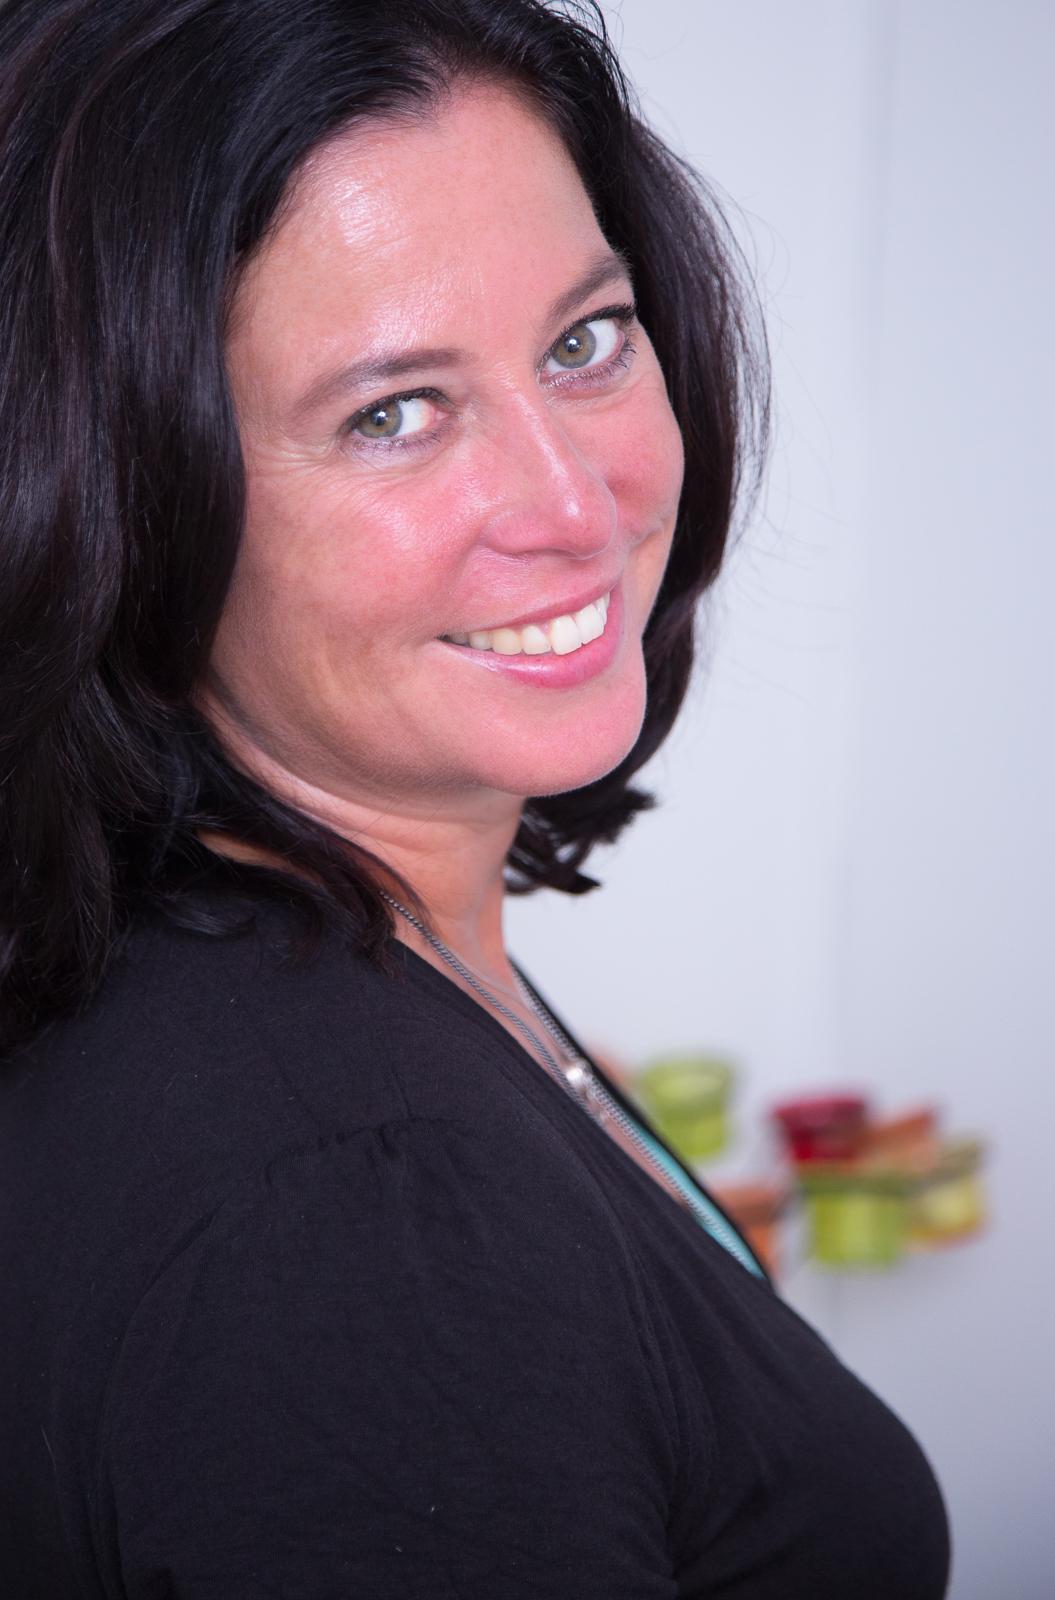 Gabrielle Rijnenberg